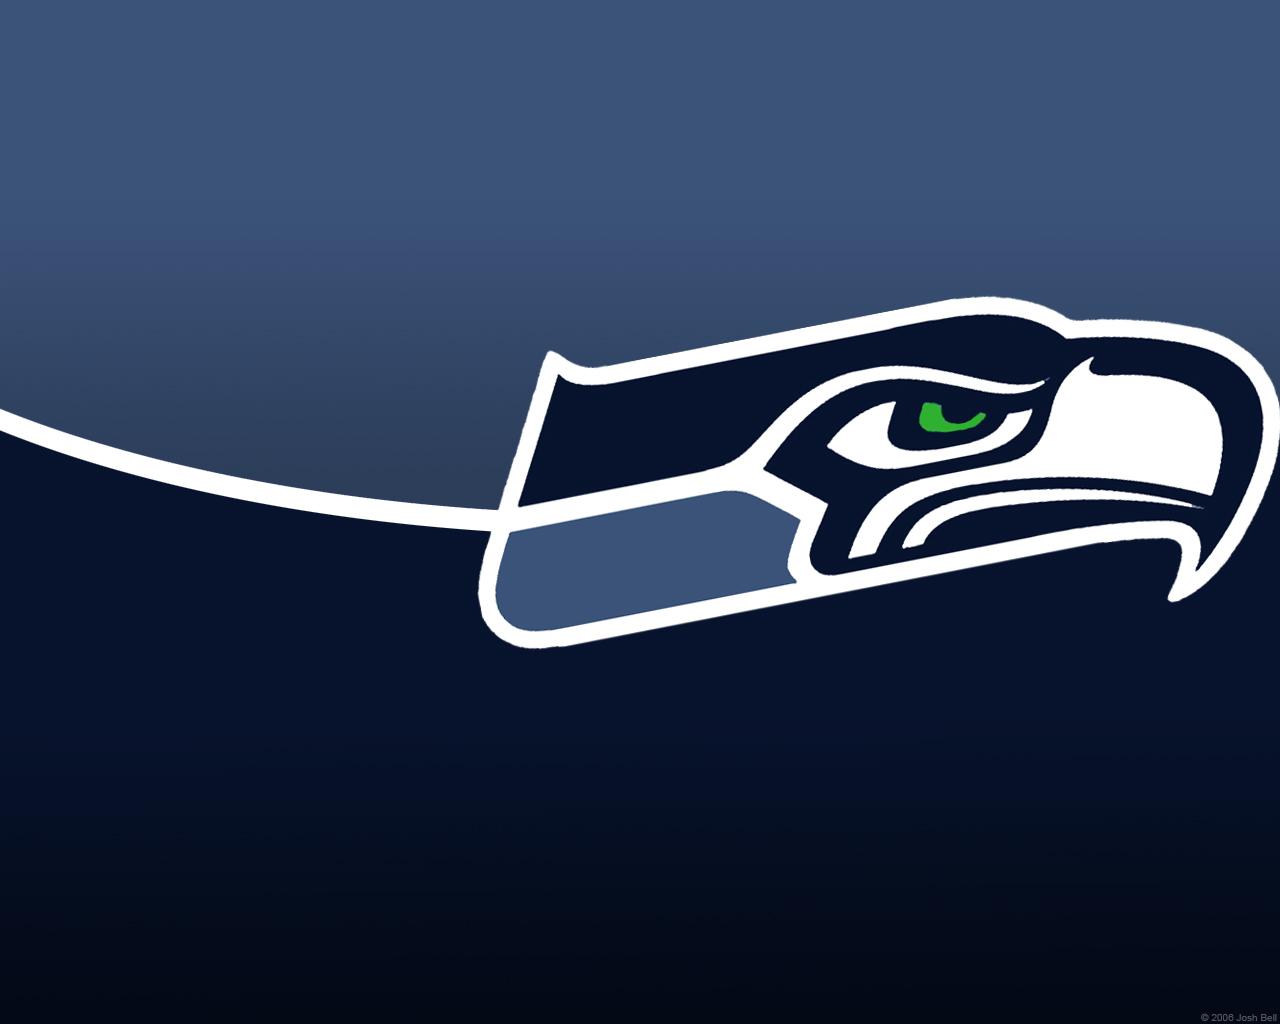 Team Logo Of Seattle Seahawks Free Image